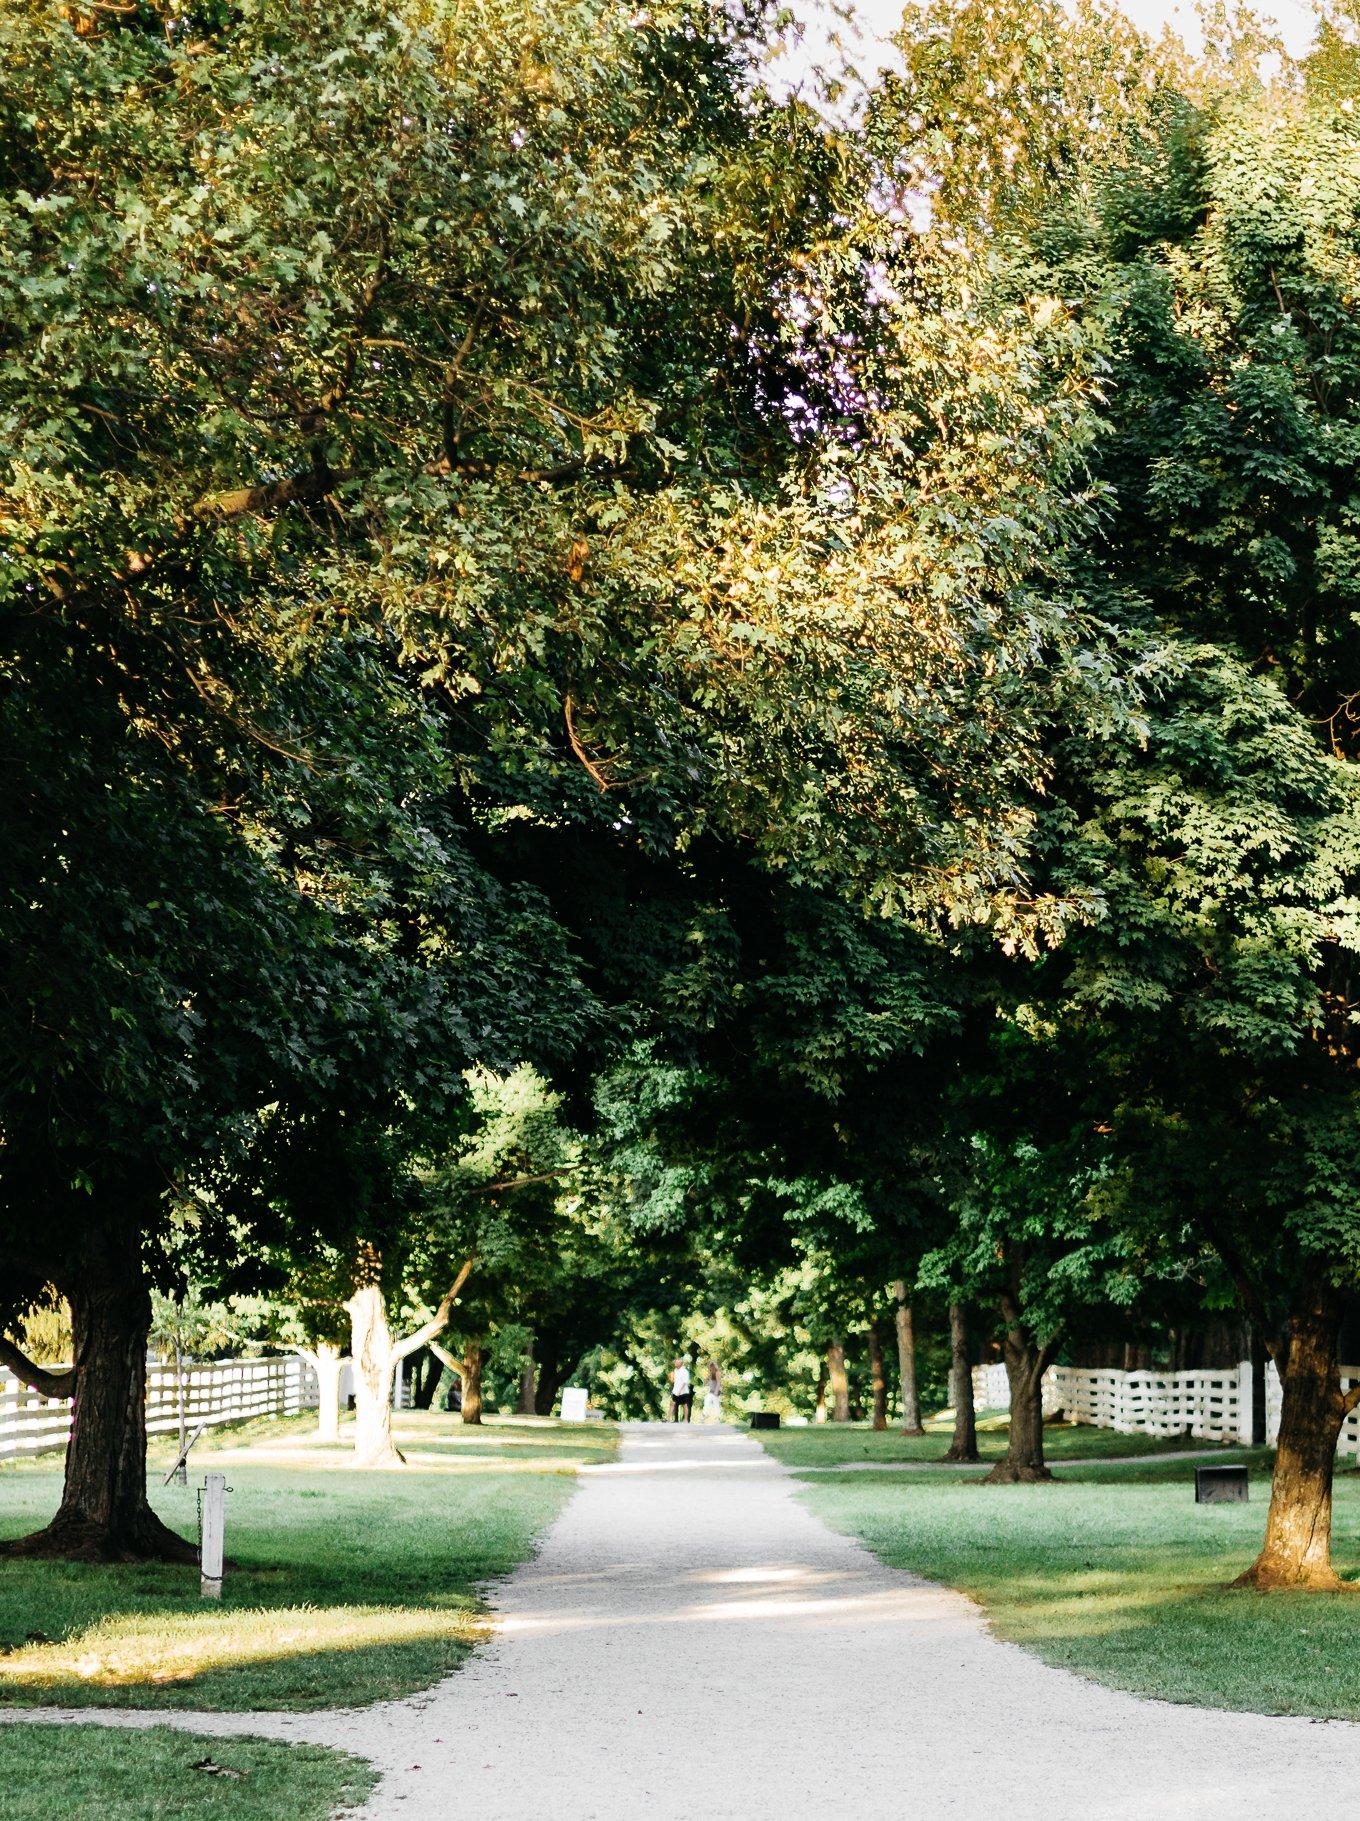 shaker village, shaker village of pleasant hill, shaking quakers, kentucky landmarks, kentucky blog